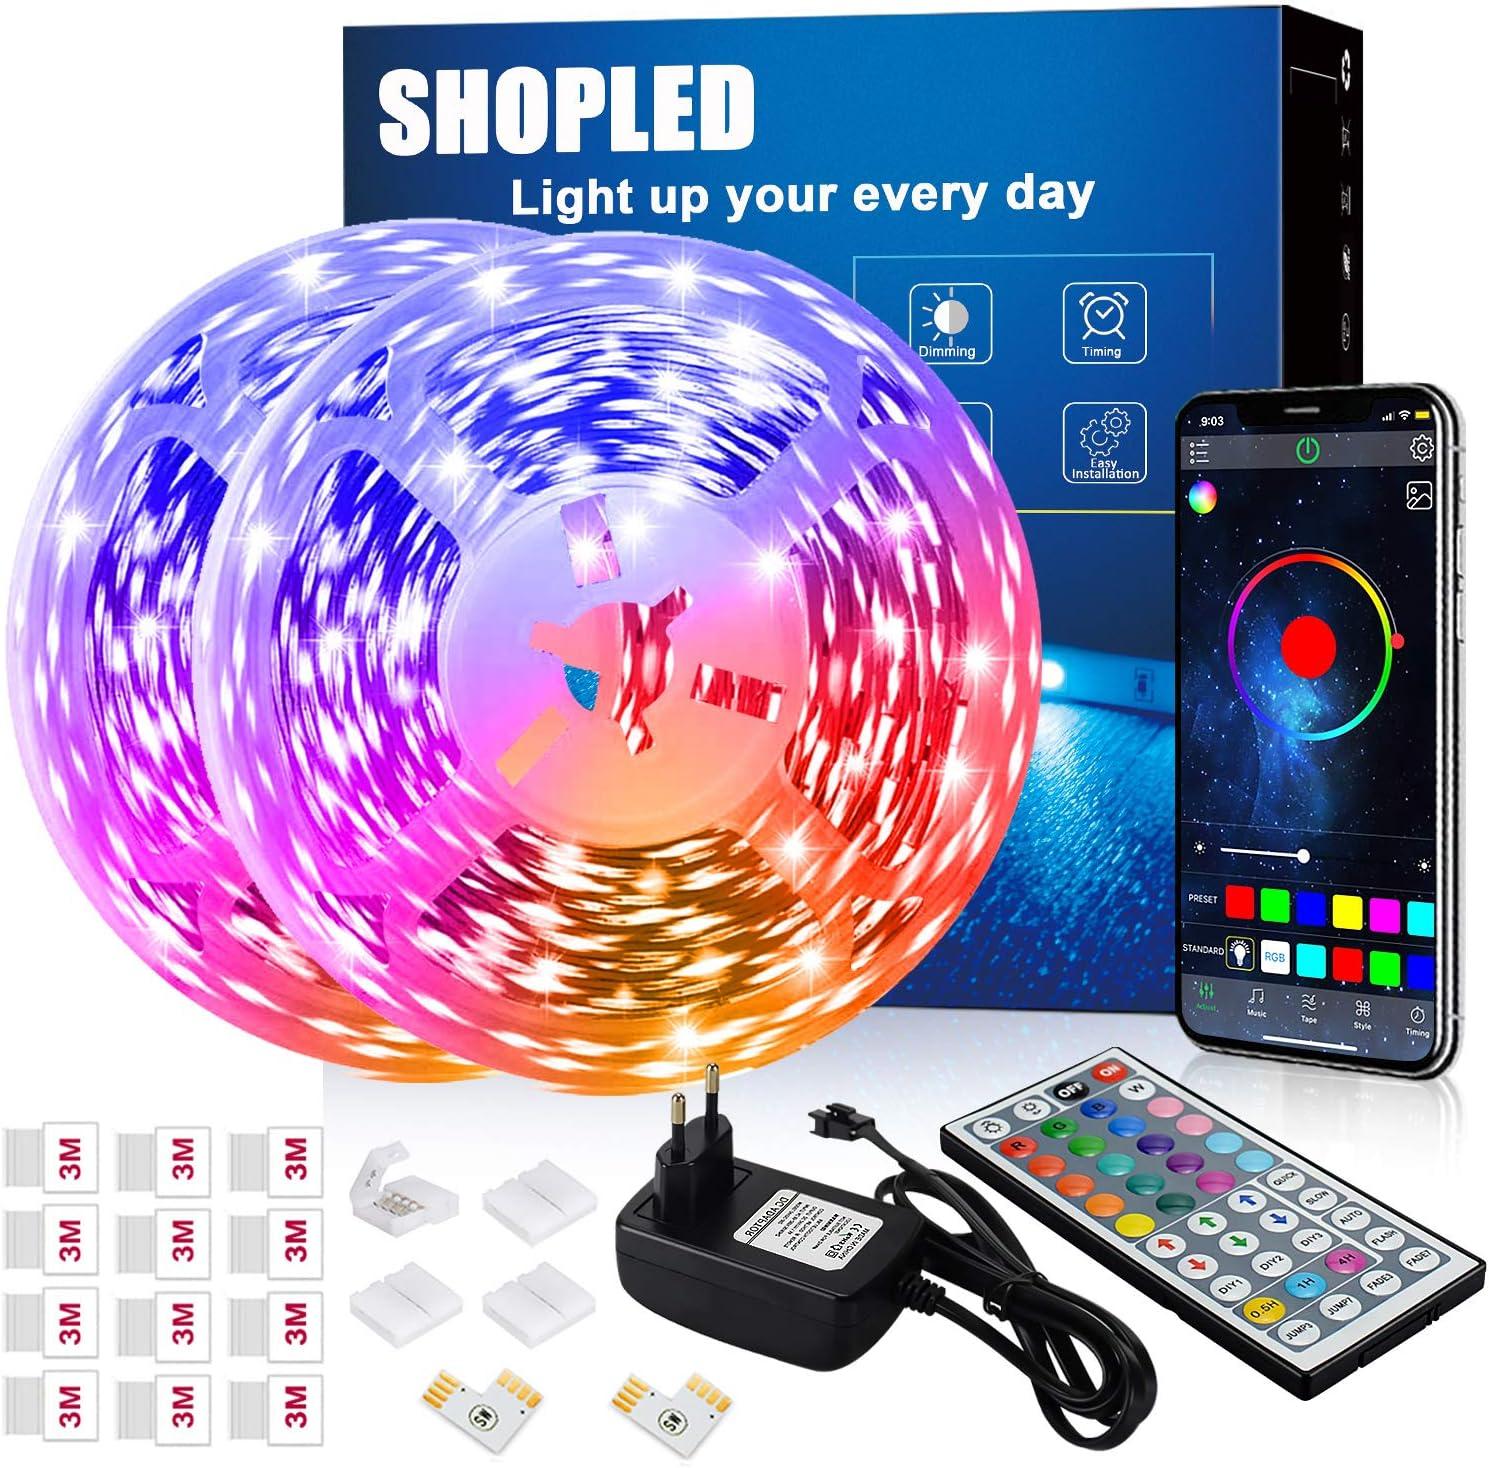 Tira LED 12M, SHOPLED Bluetooth Music Sync SMD 5050 RGB Tiras LED con Control de Aplicación, 44 Teclas de Control Remoto para Dormitorio, Cocina, TV, Fiesta, Decorativas Habitación